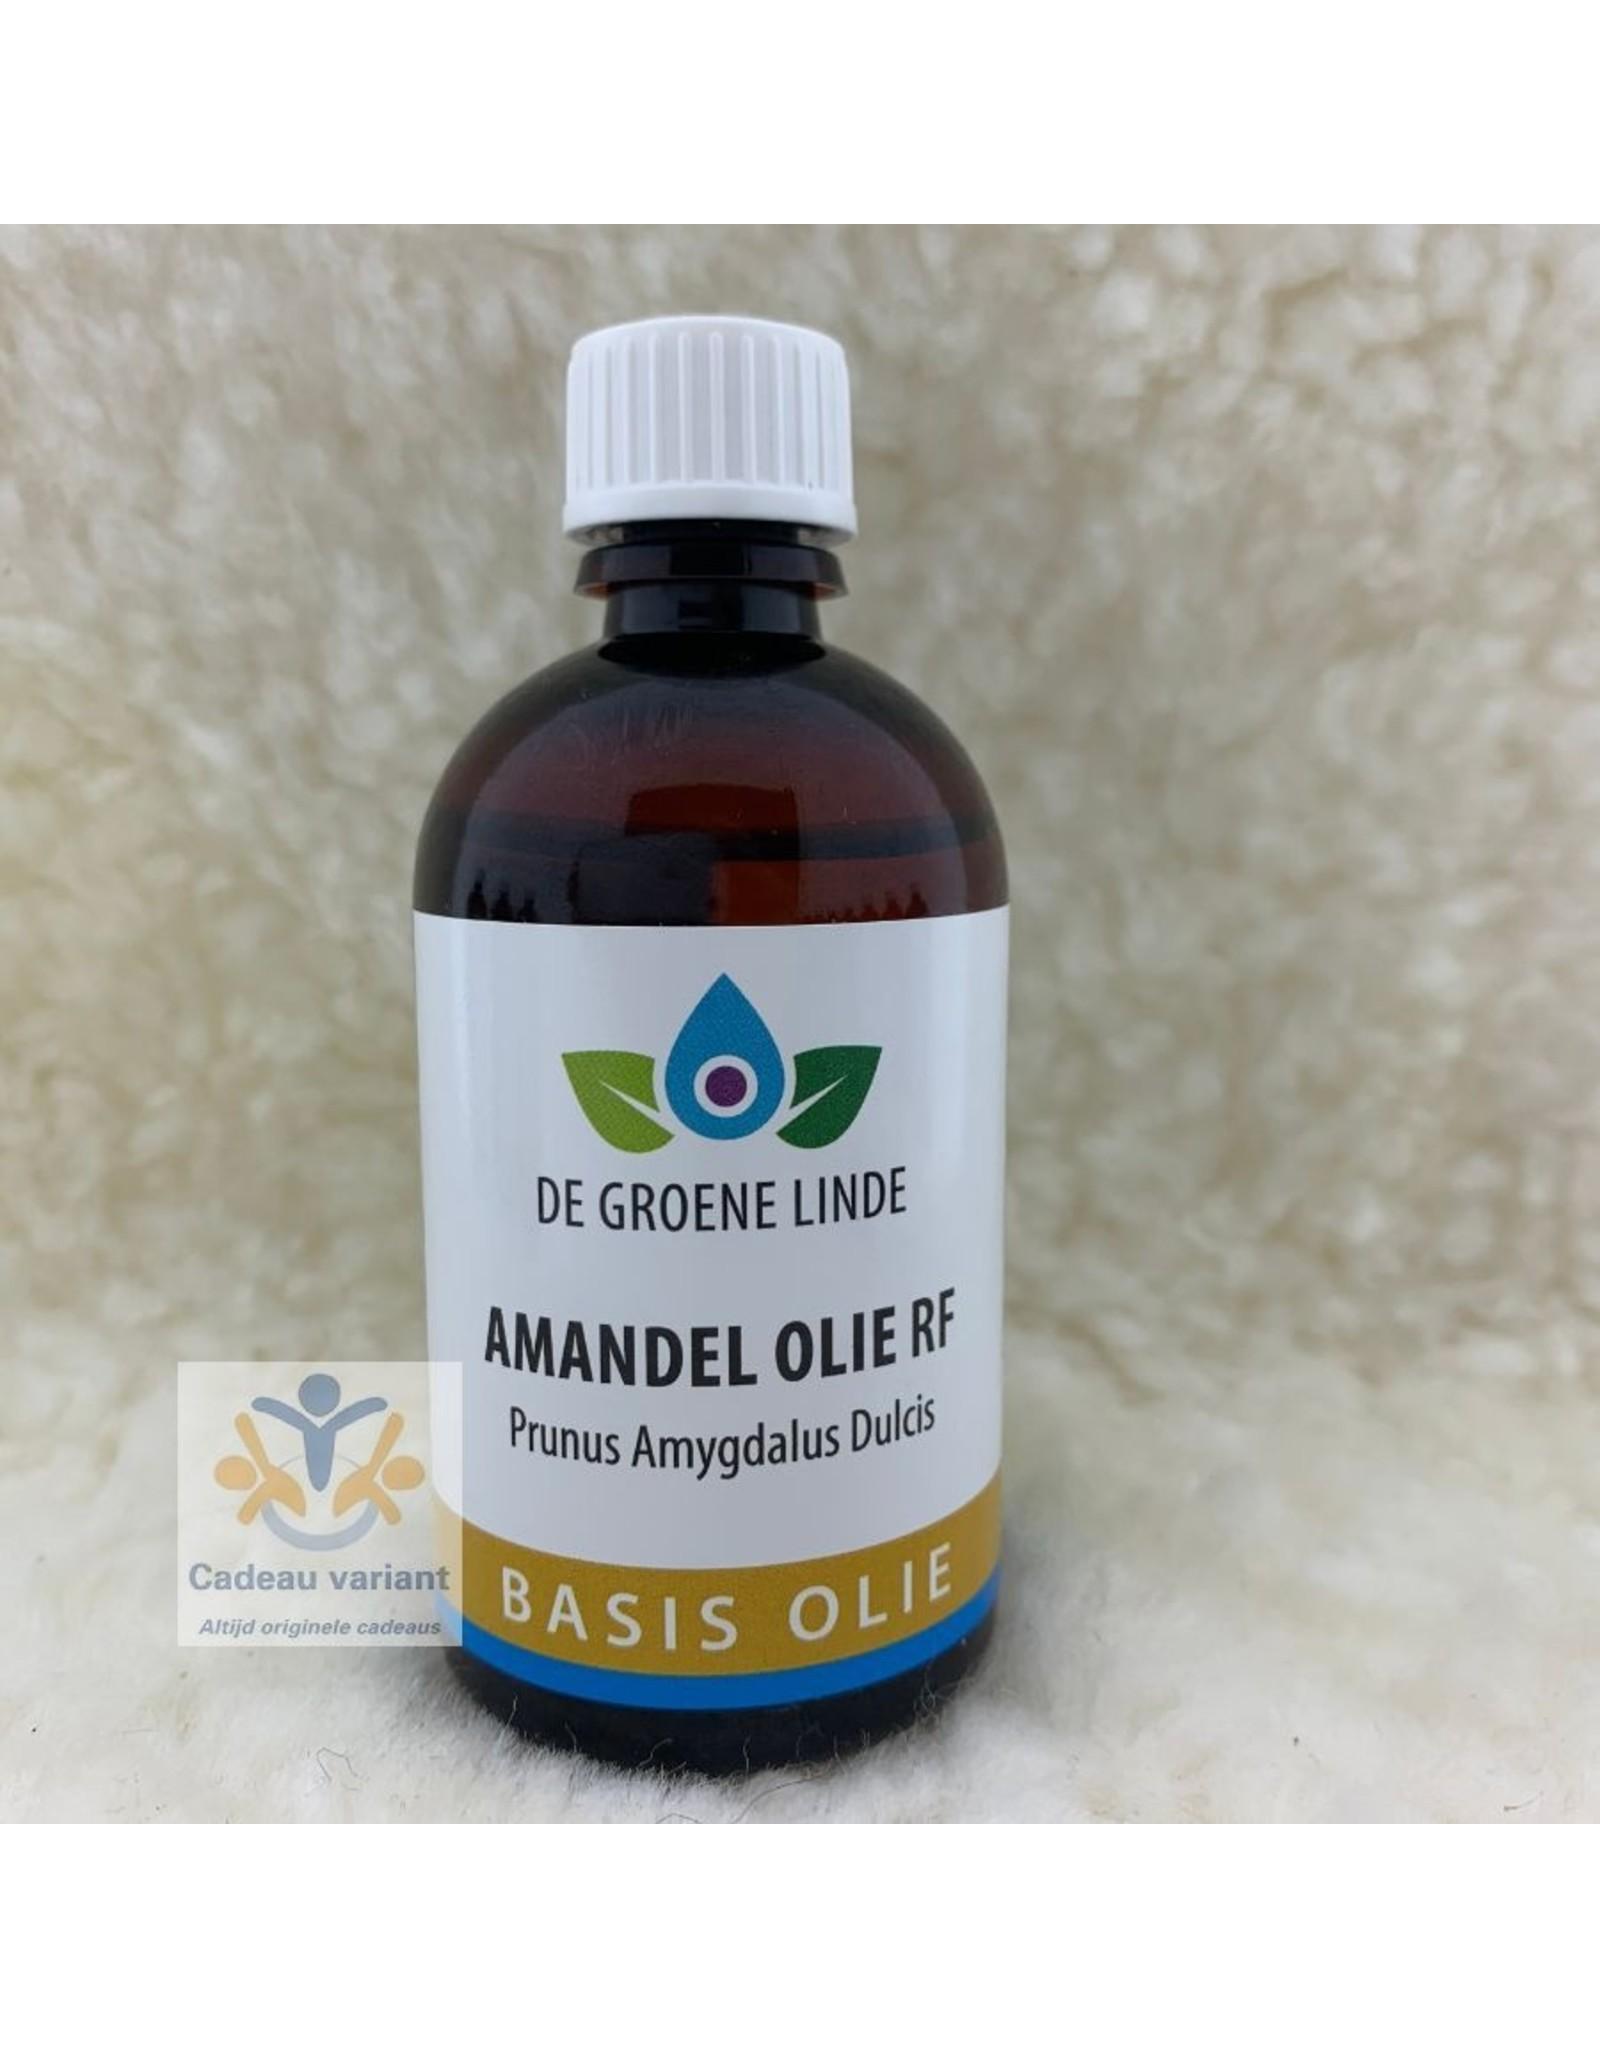 De Groene Linde Amandel olie RF 100 ml